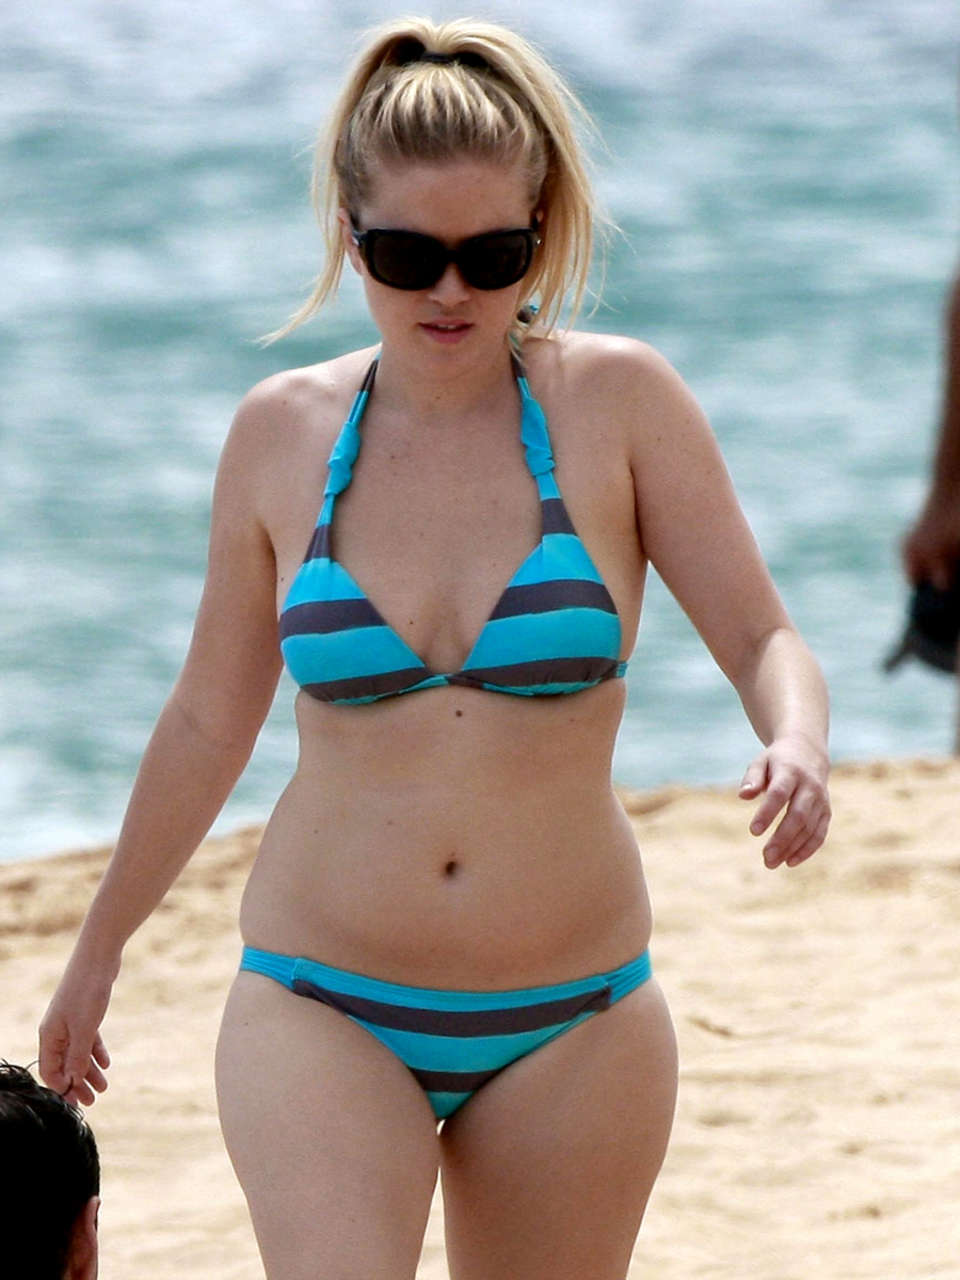 Teen Wallpapers For Girls Amber Meade Bikini Candids In Hawaii 04 Gotceleb